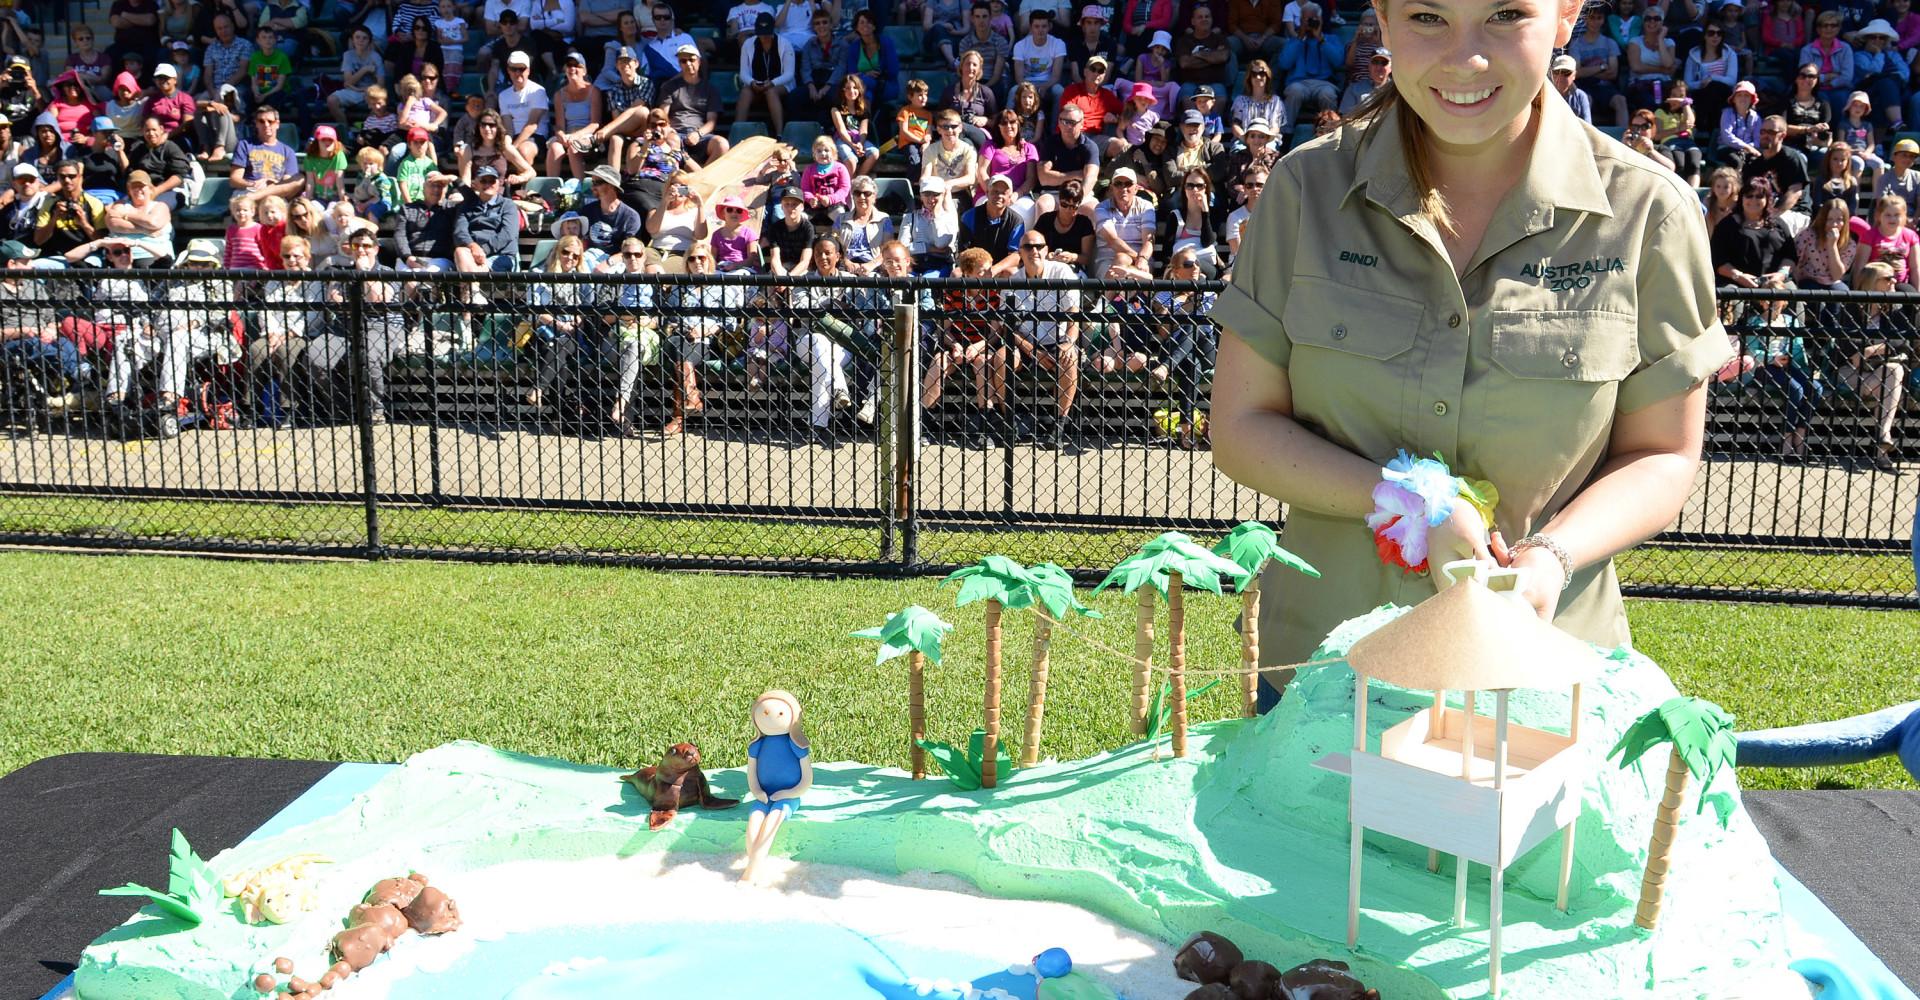 Celebrate Bindi Irwin's birthday at the Australia Zoo